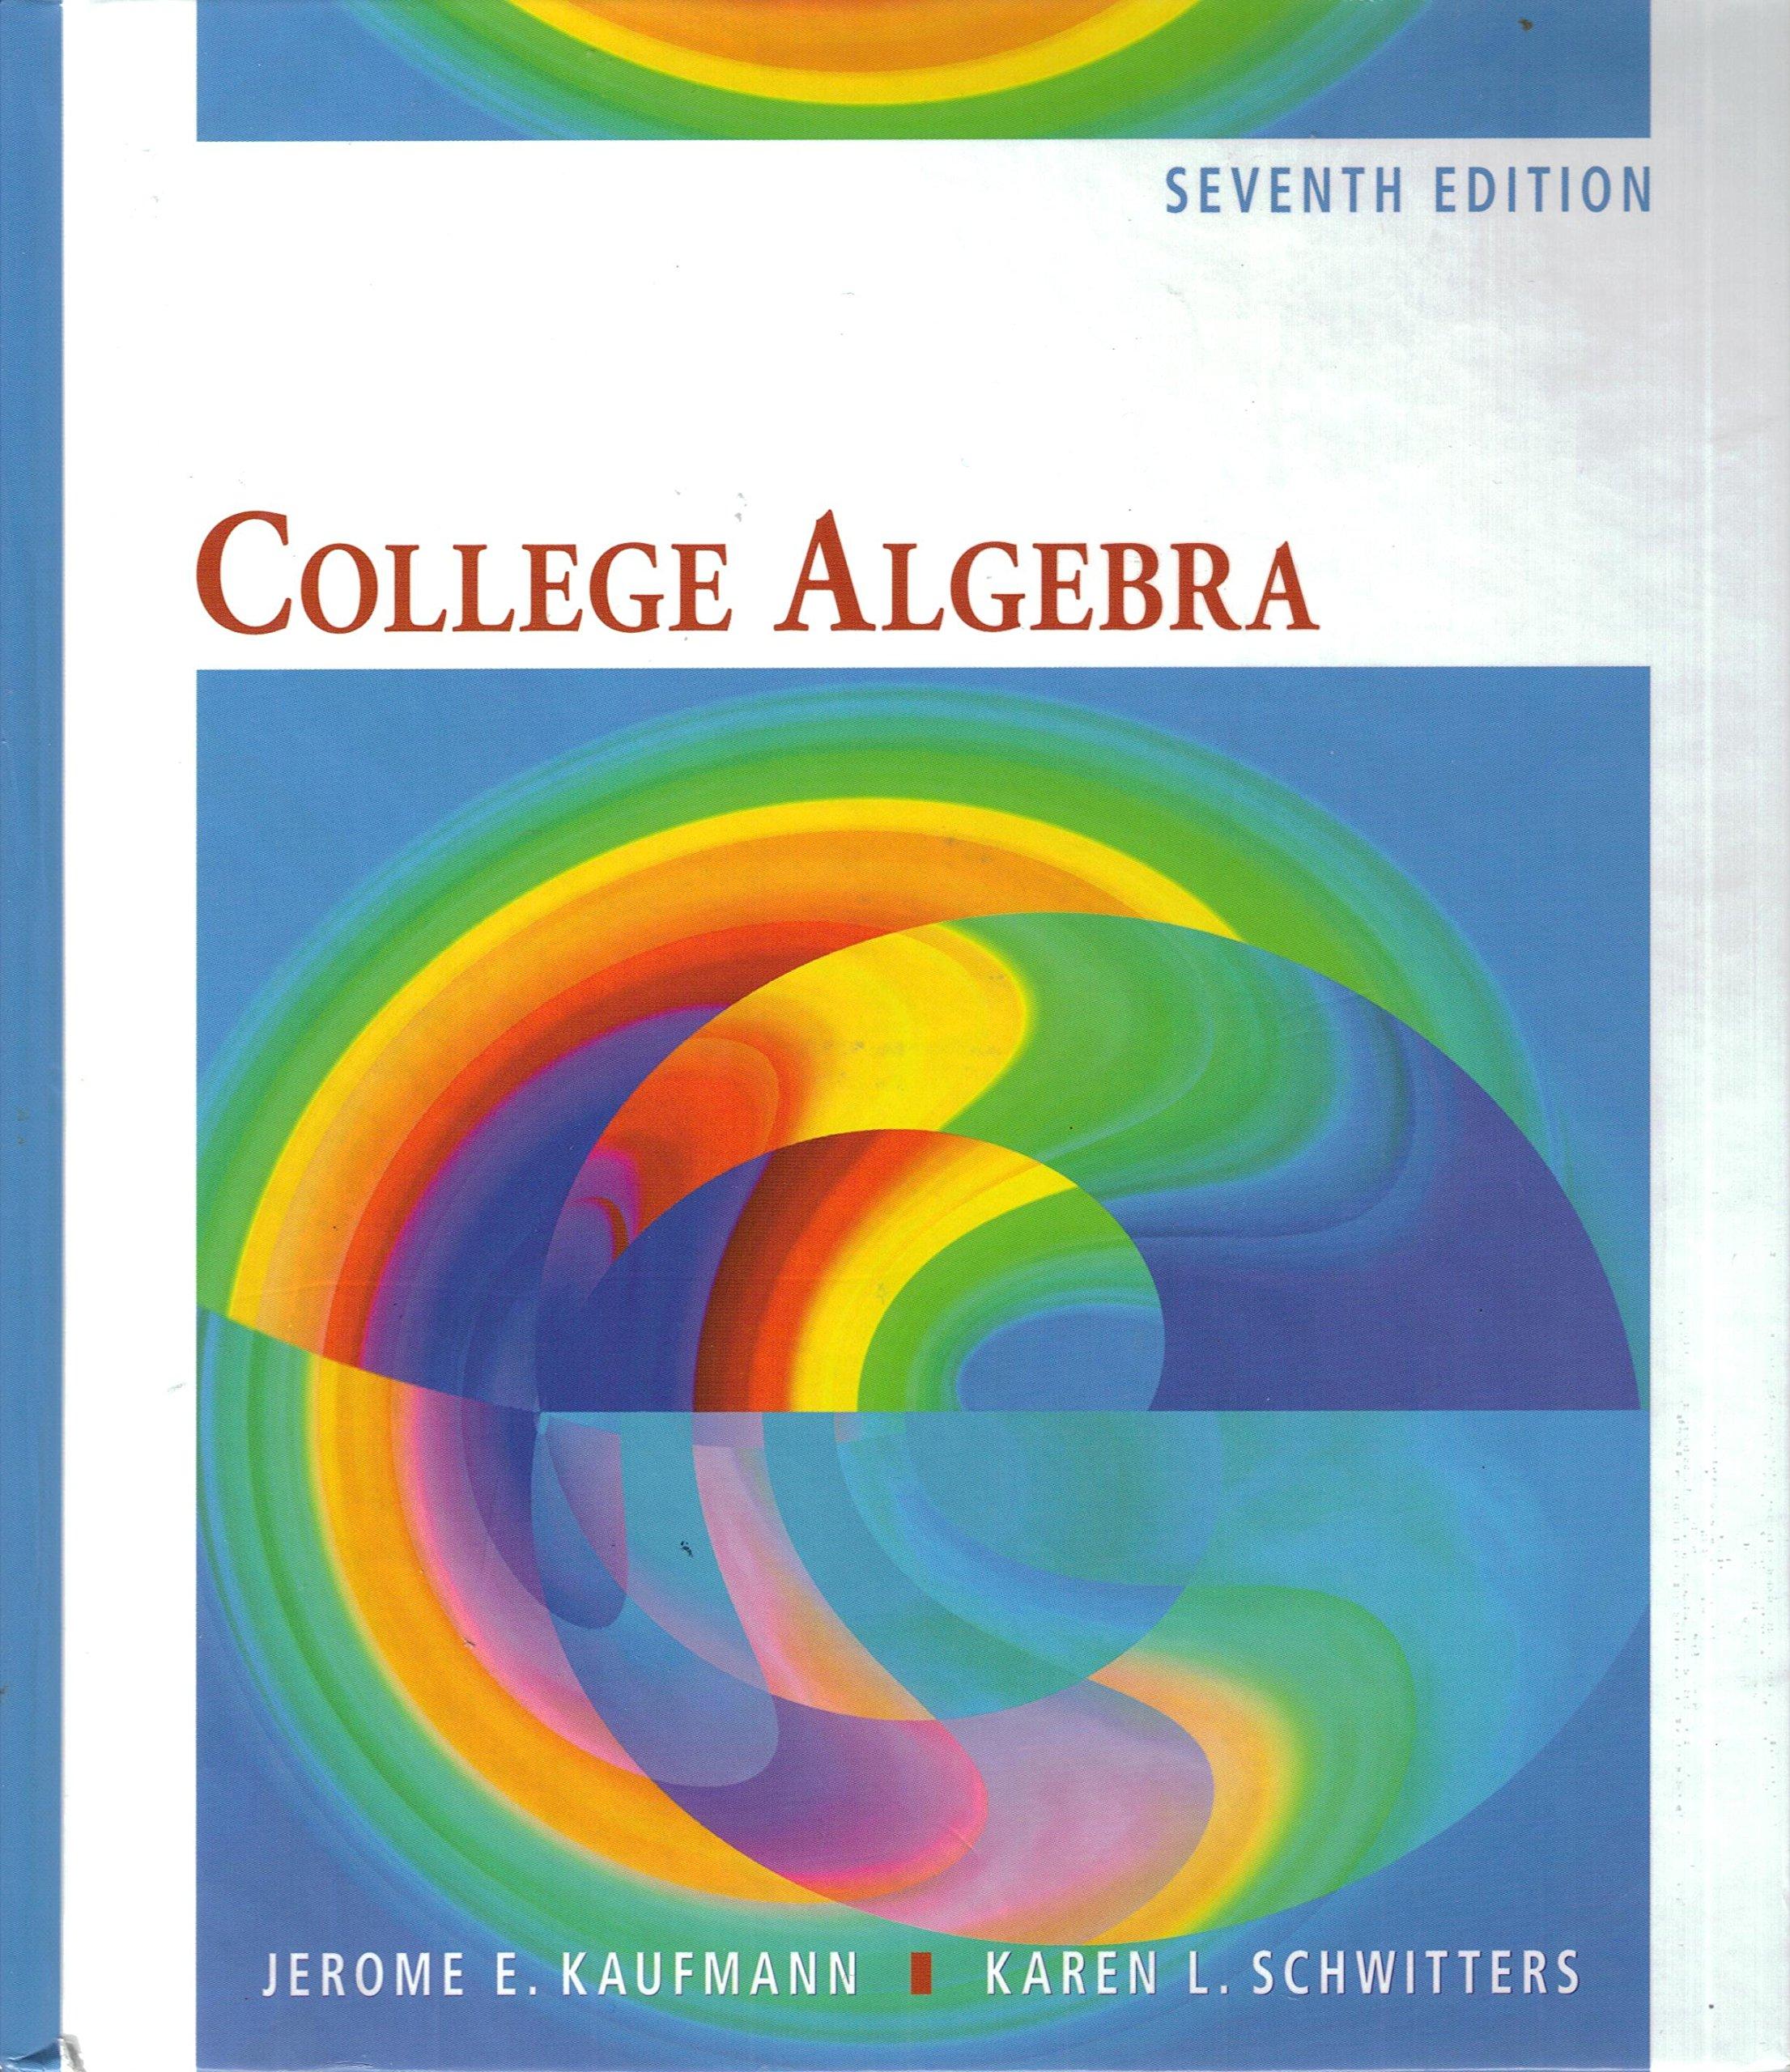 College Algebra: Jerome E. Kaufmann, Karen L. Schwitters: Amazon.com: Books